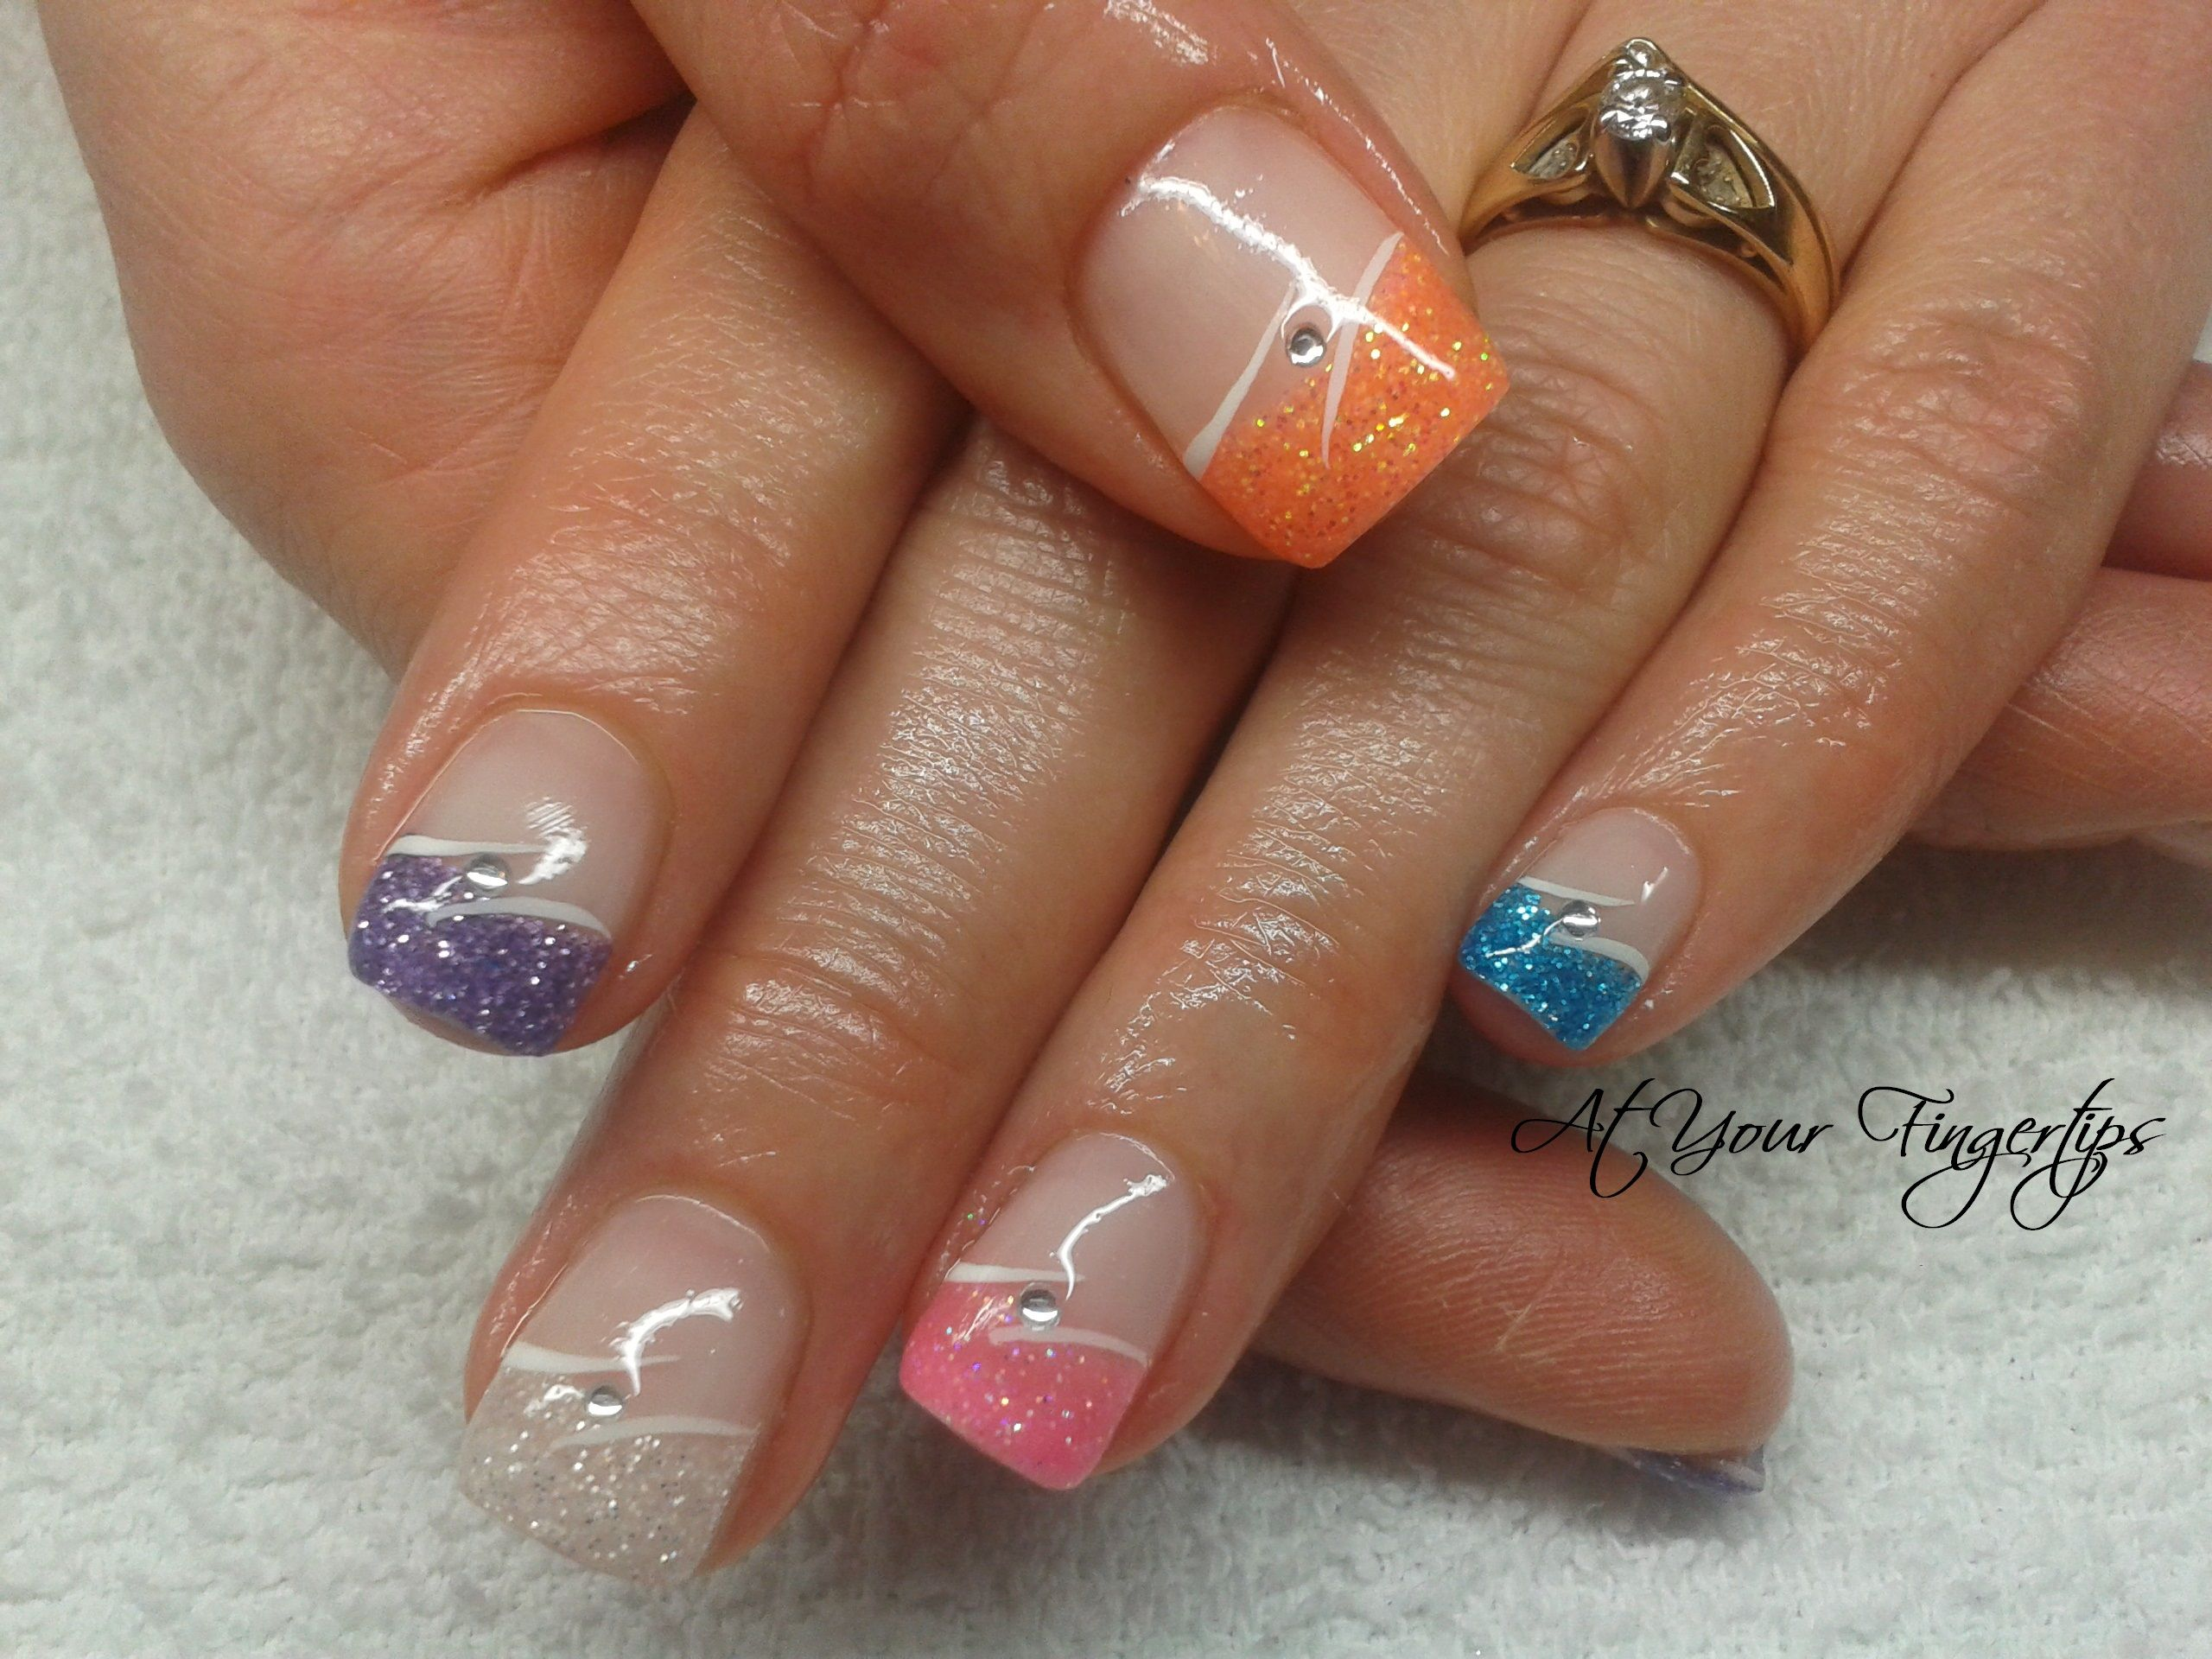 gel nails | nail art | Pinterest | Fancy nail art, Fancy nails ...